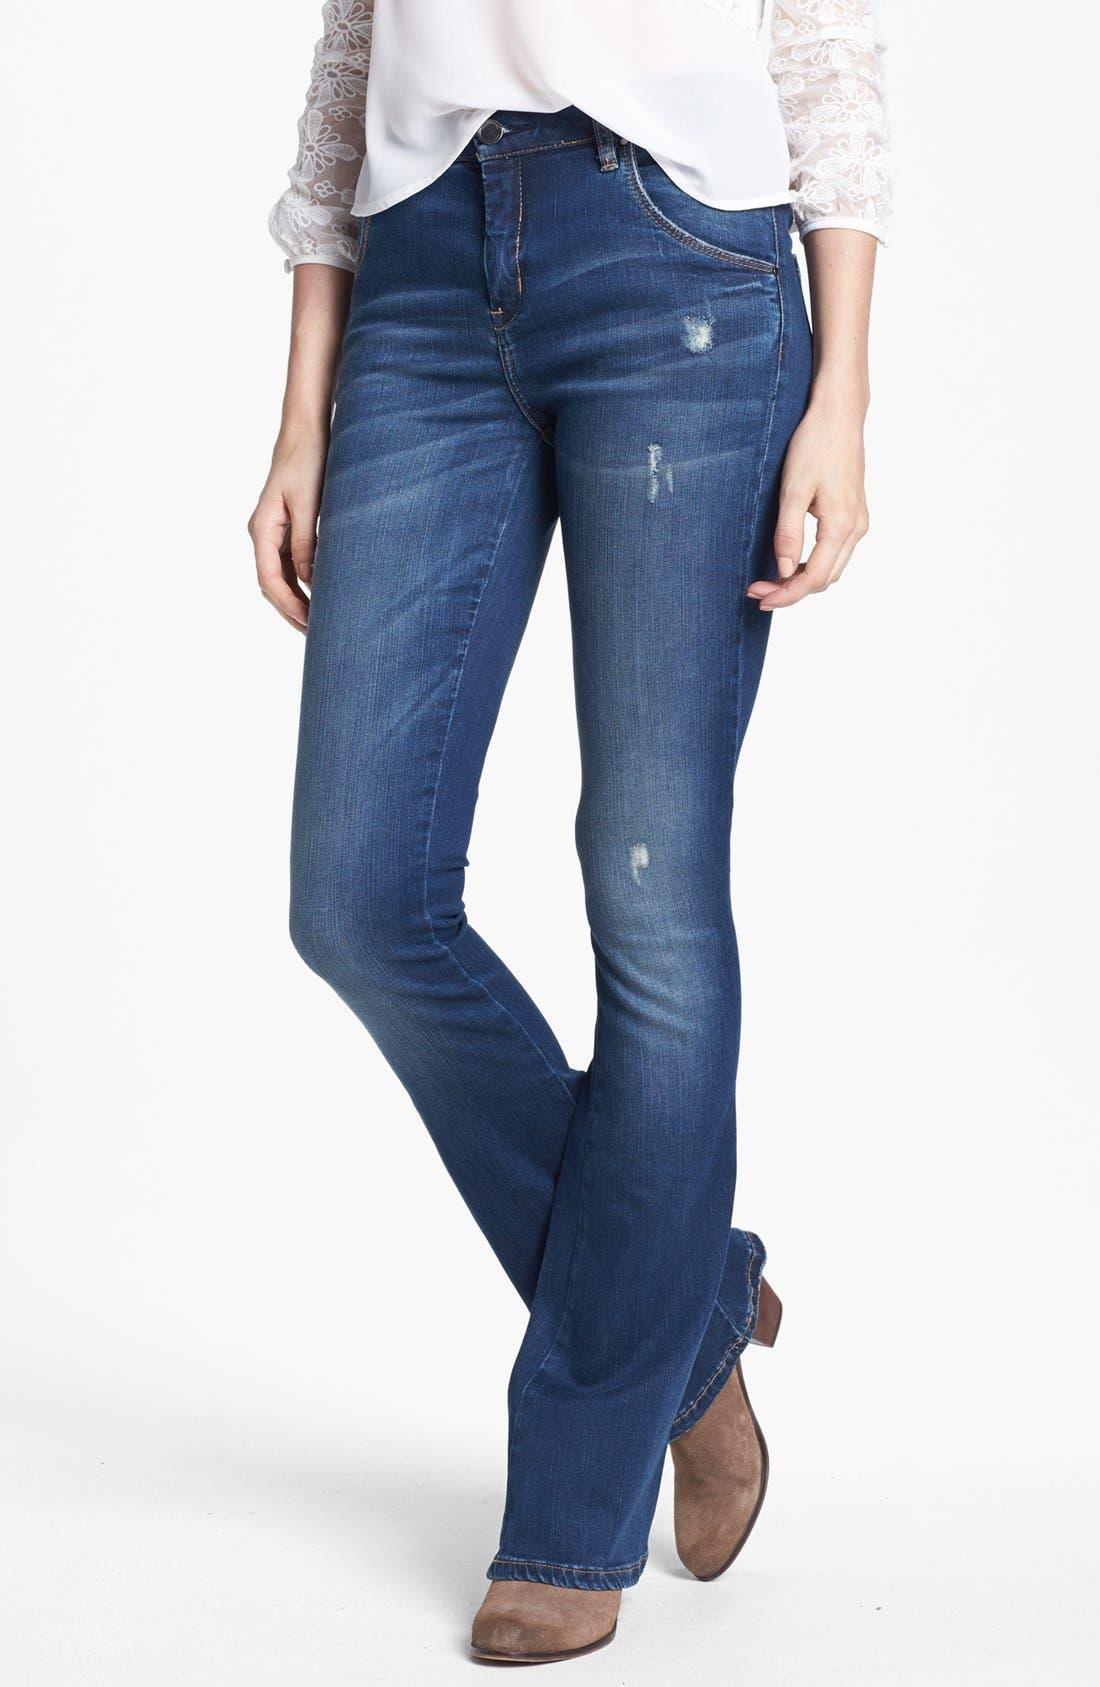 Alternate Image 1 Selected - BLANKNYC 'Short Stack' Flare Leg Jeans